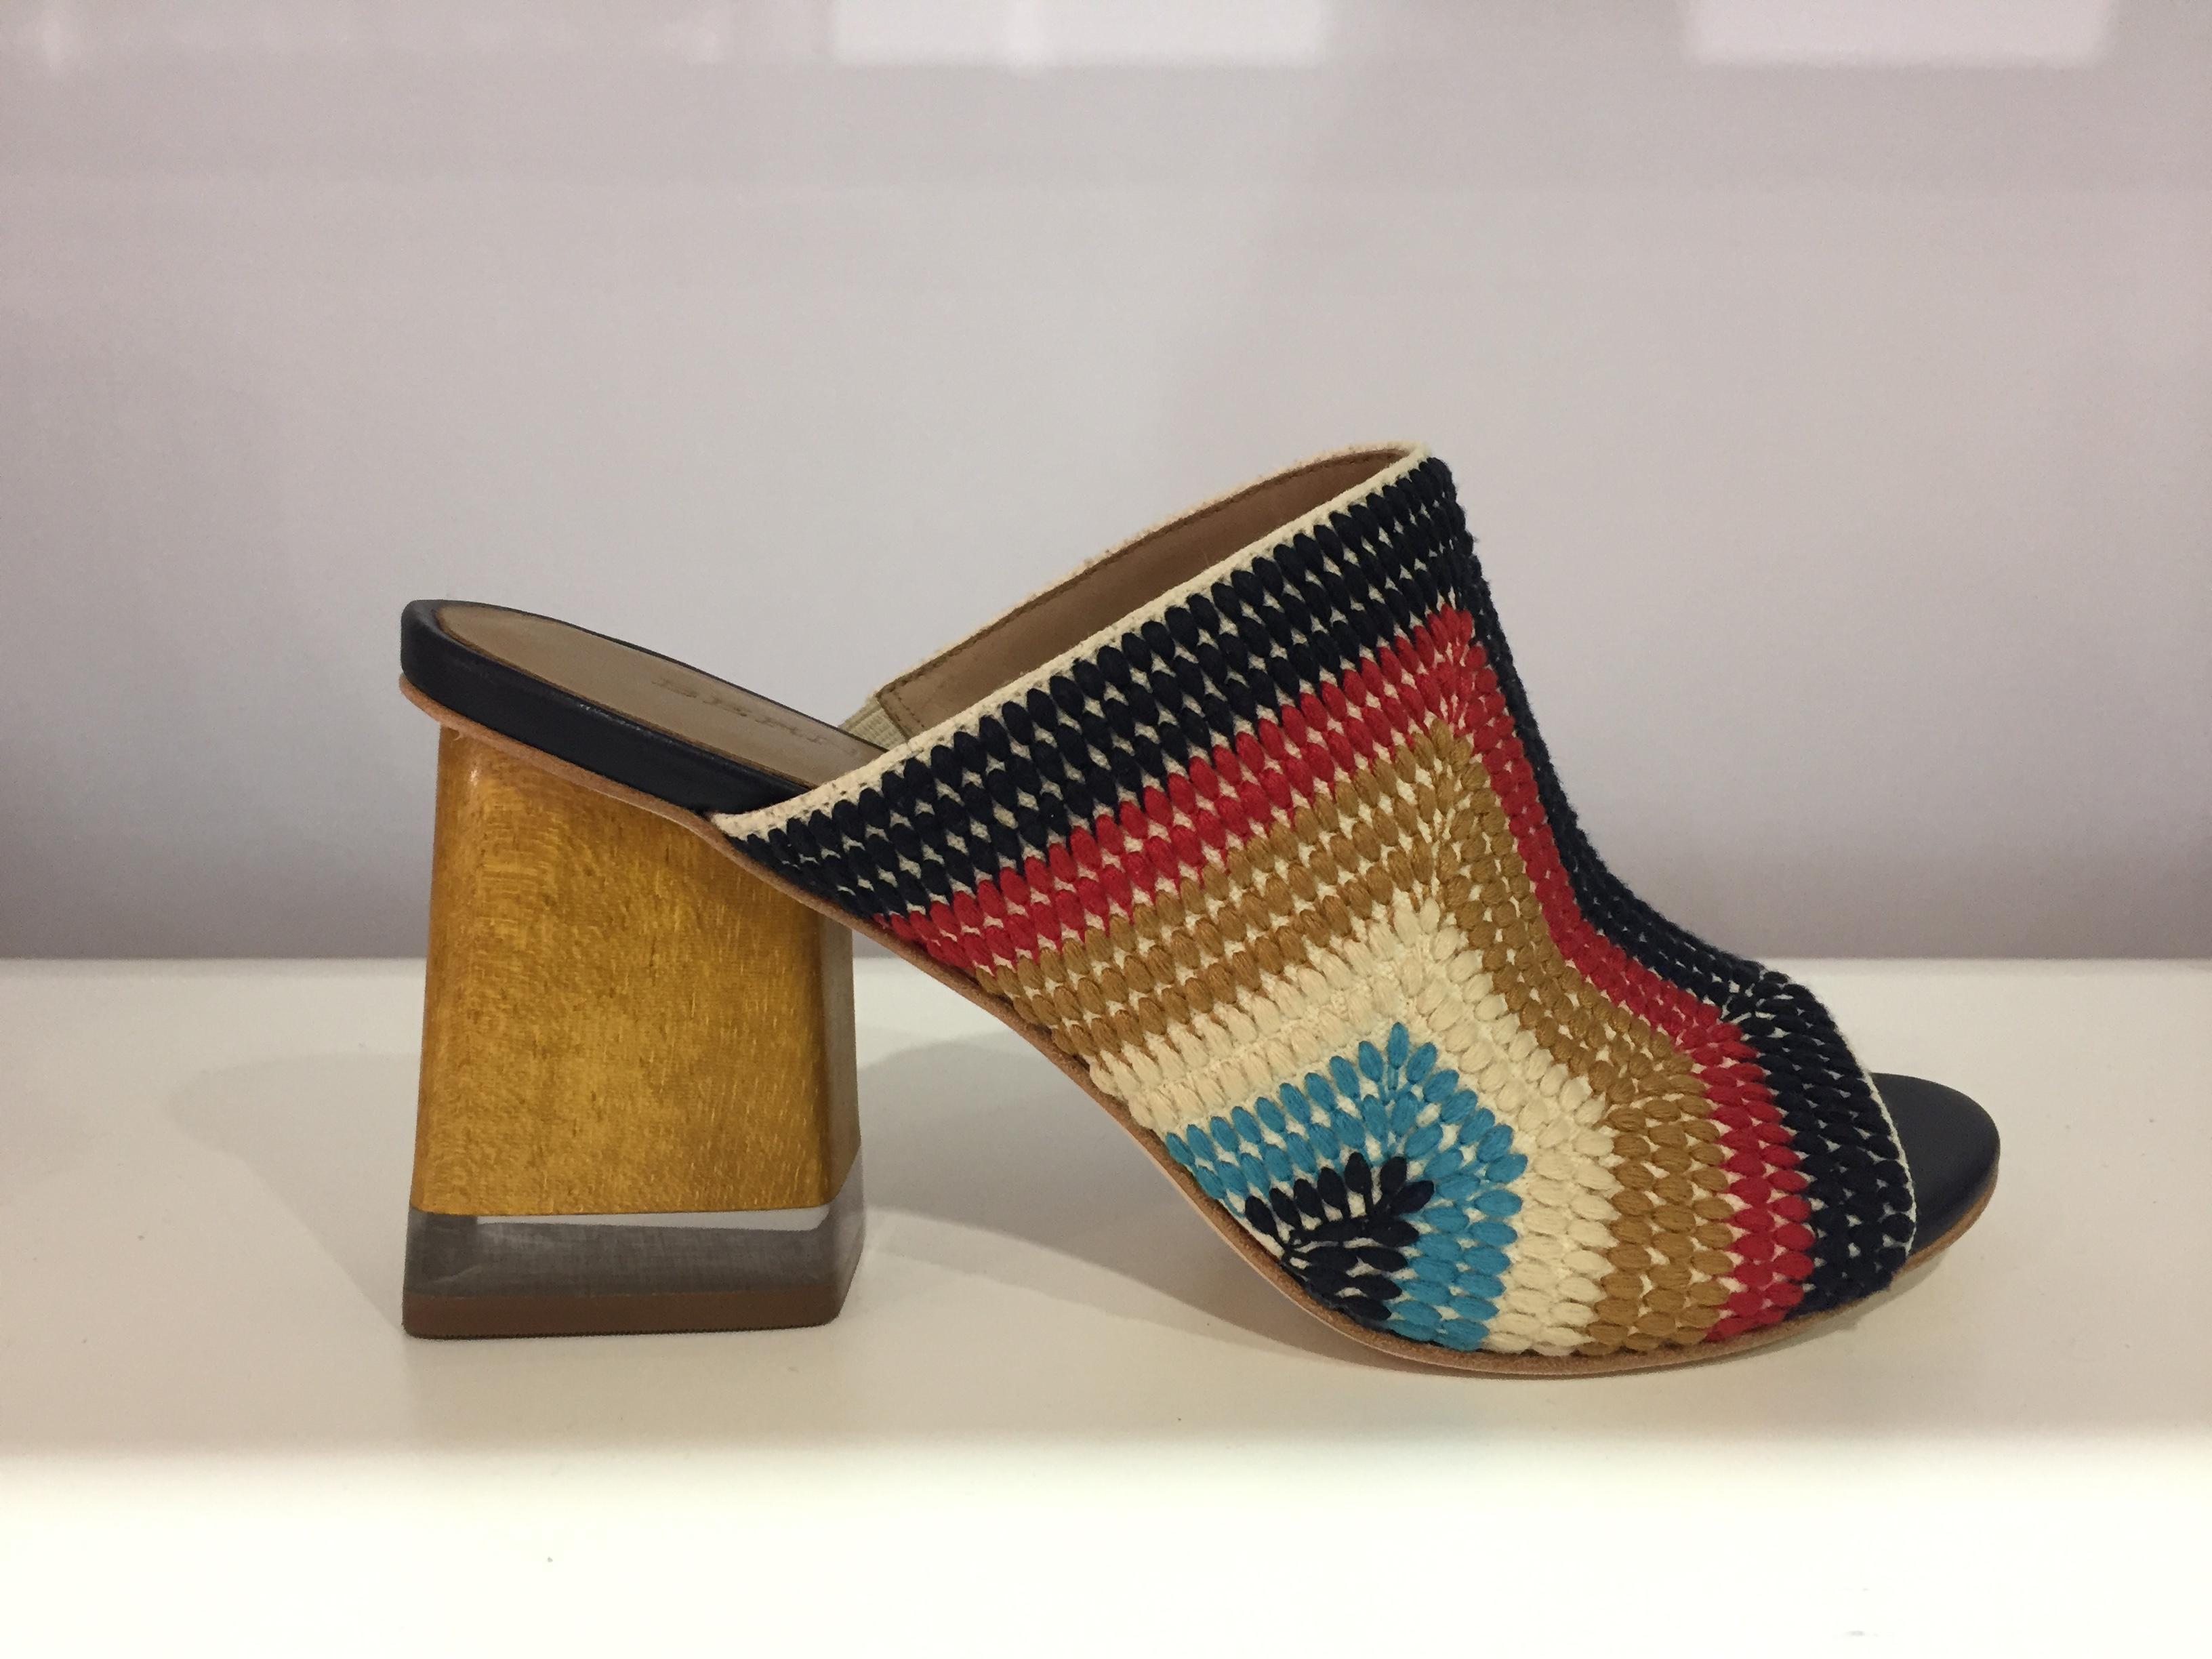 A jute stitched heel style from Bernardo.